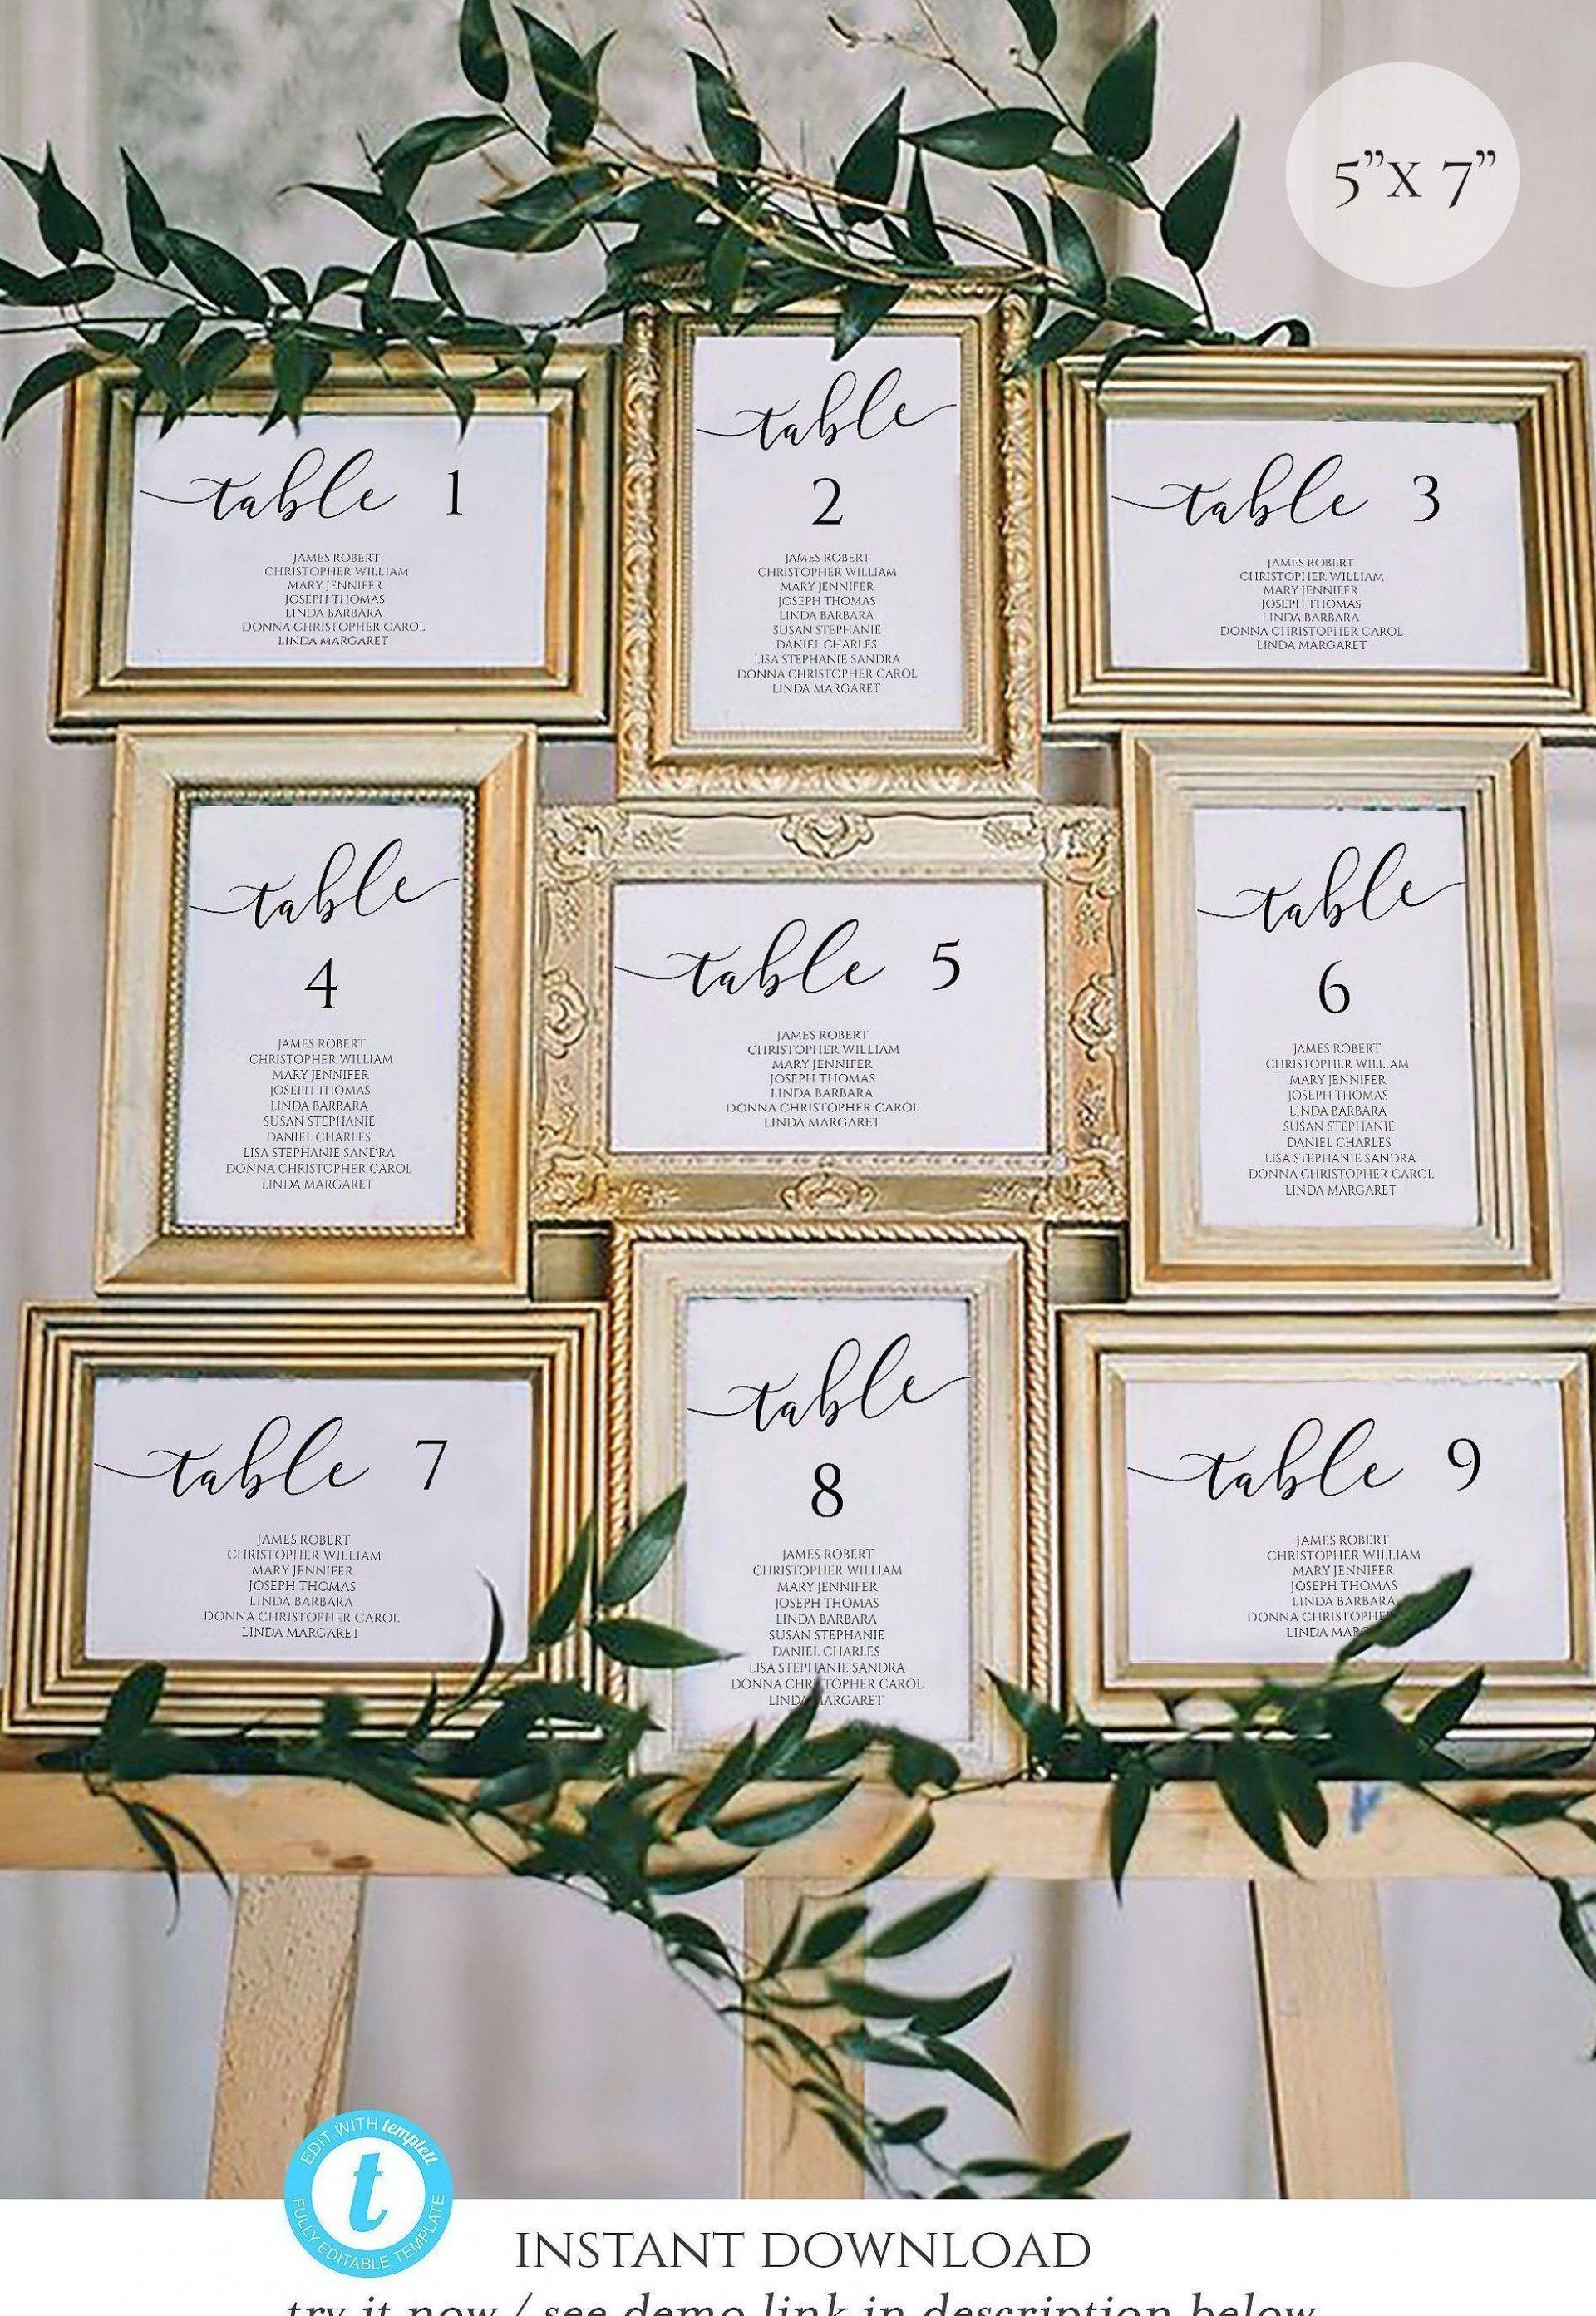 5x7 Wedding Seating Chart Template Calligraphy Table Seating Etsy Table Engagementtable T Seating Chart Wedding Table Seating Chart Seating Chart Template Wedding reception seating chart template